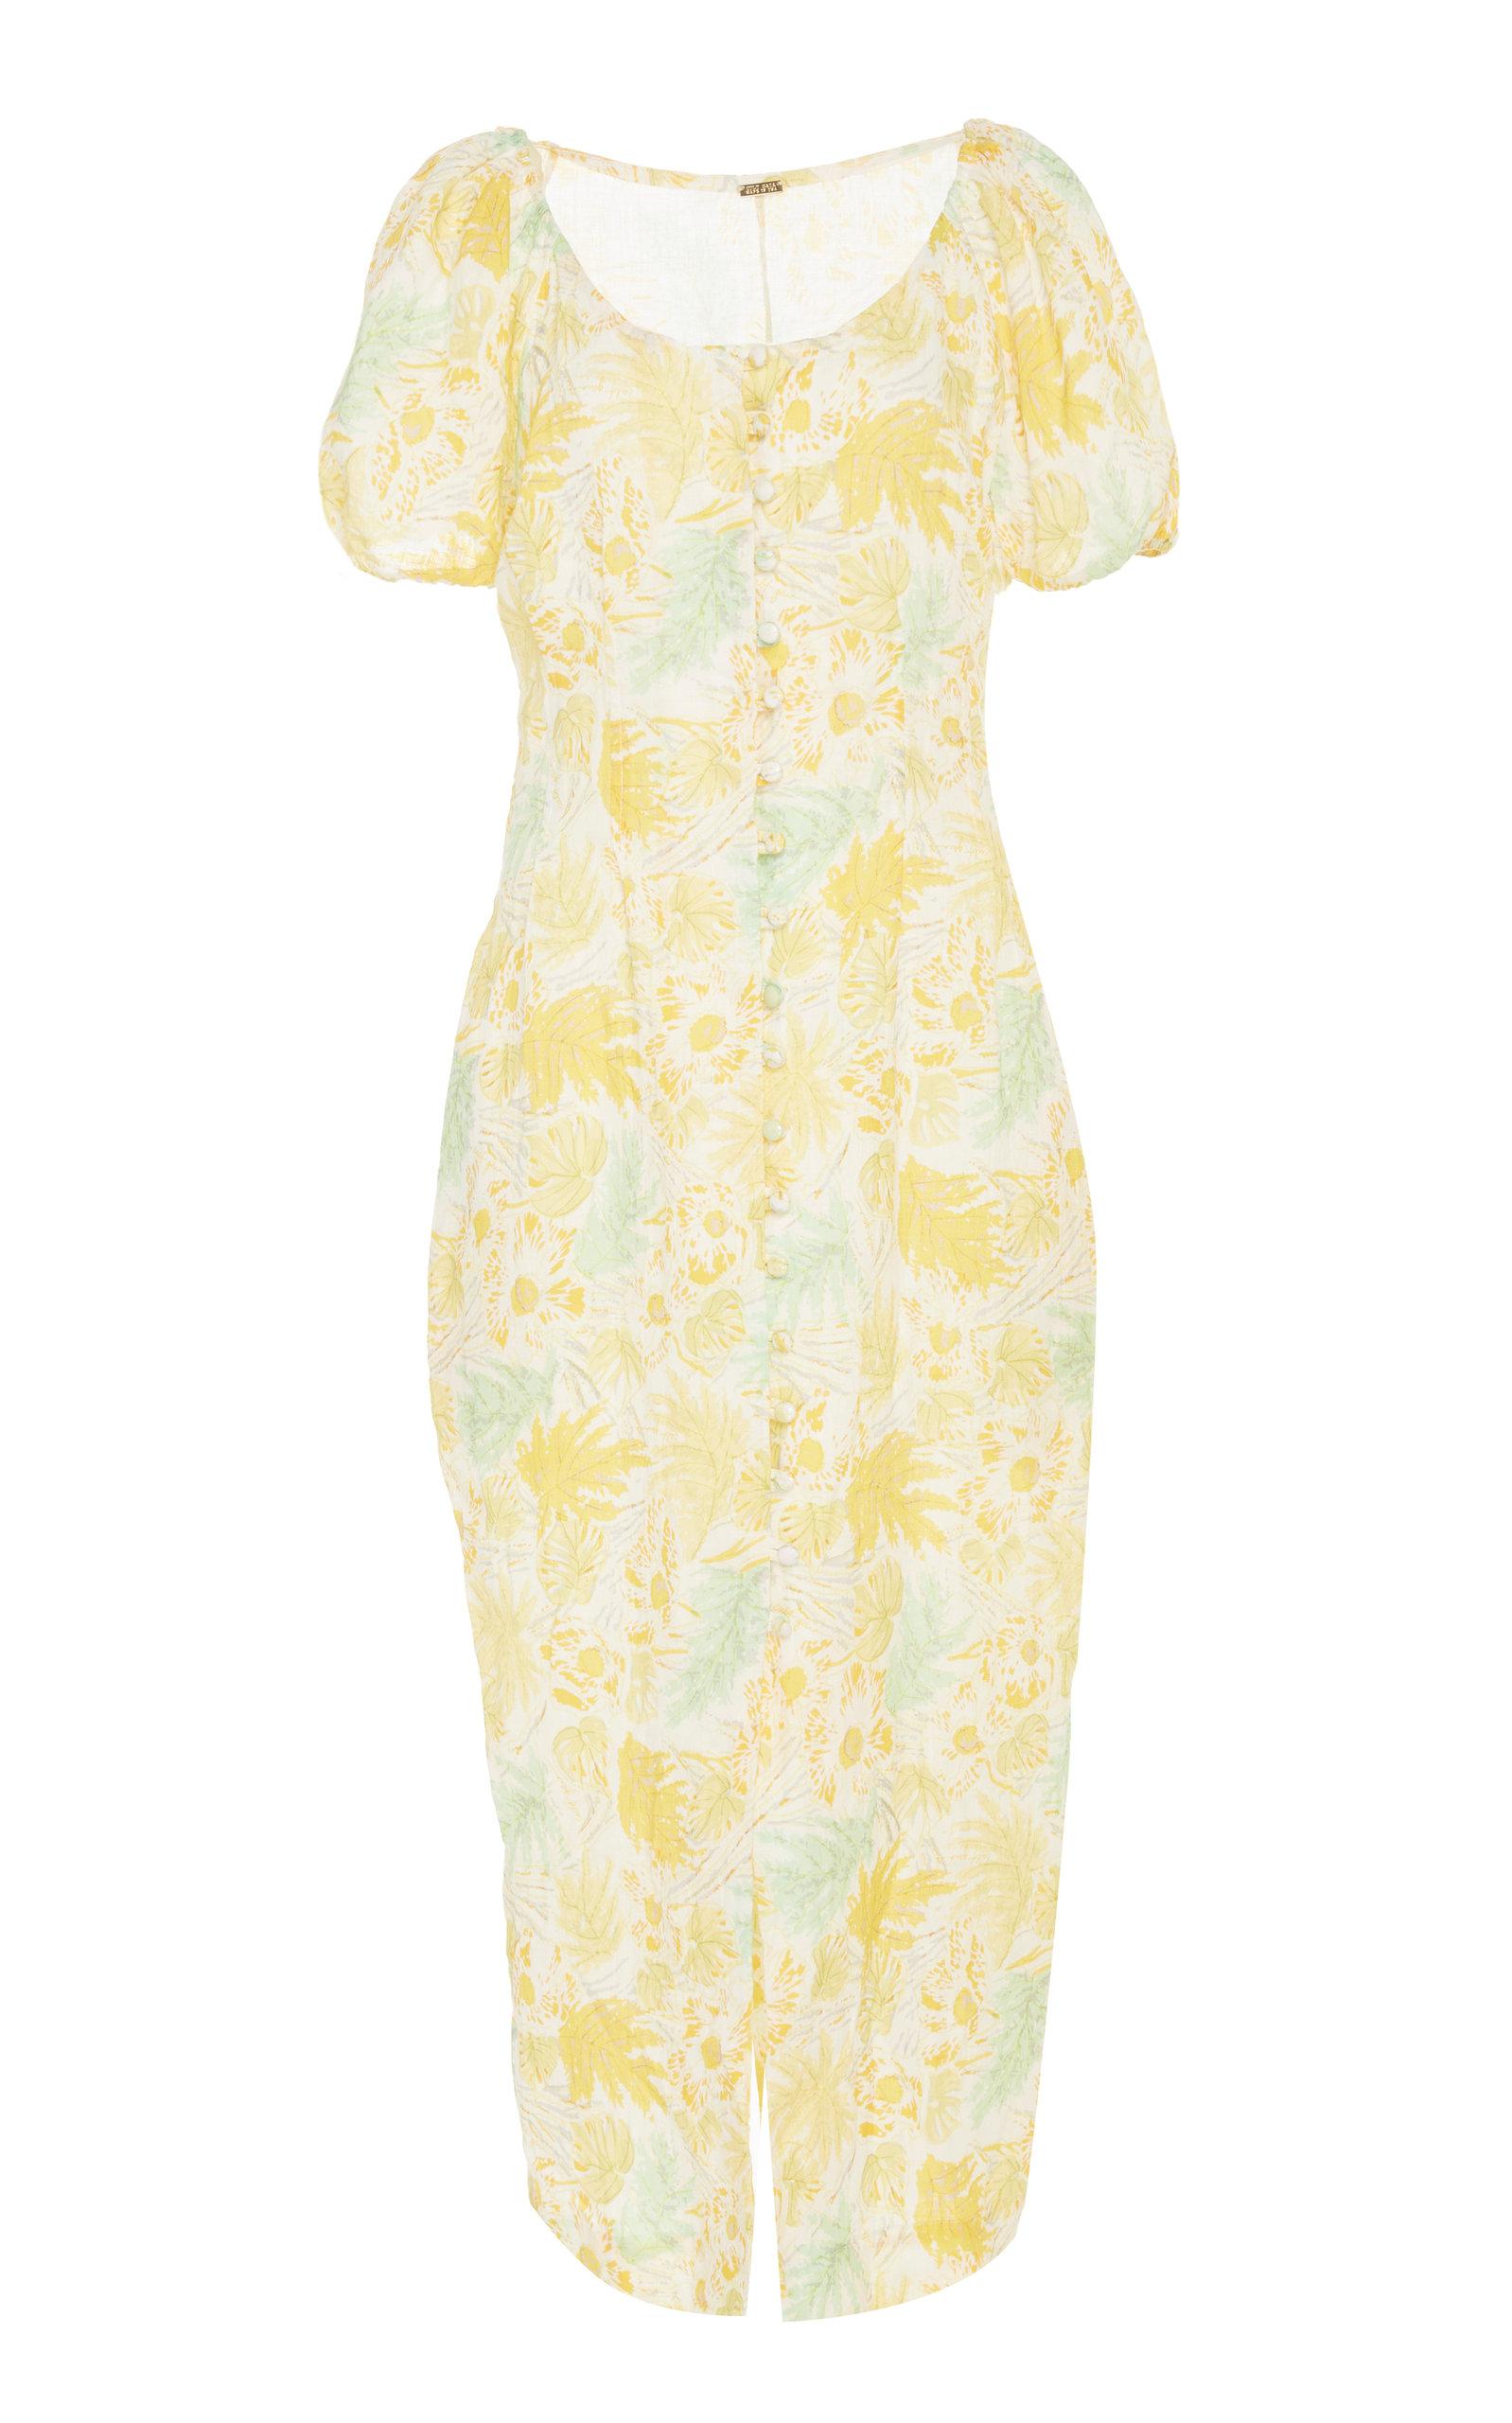 CULT GAIA | Cult Gaia Charlotte Linen And Cotton-Blend Dress | Goxip